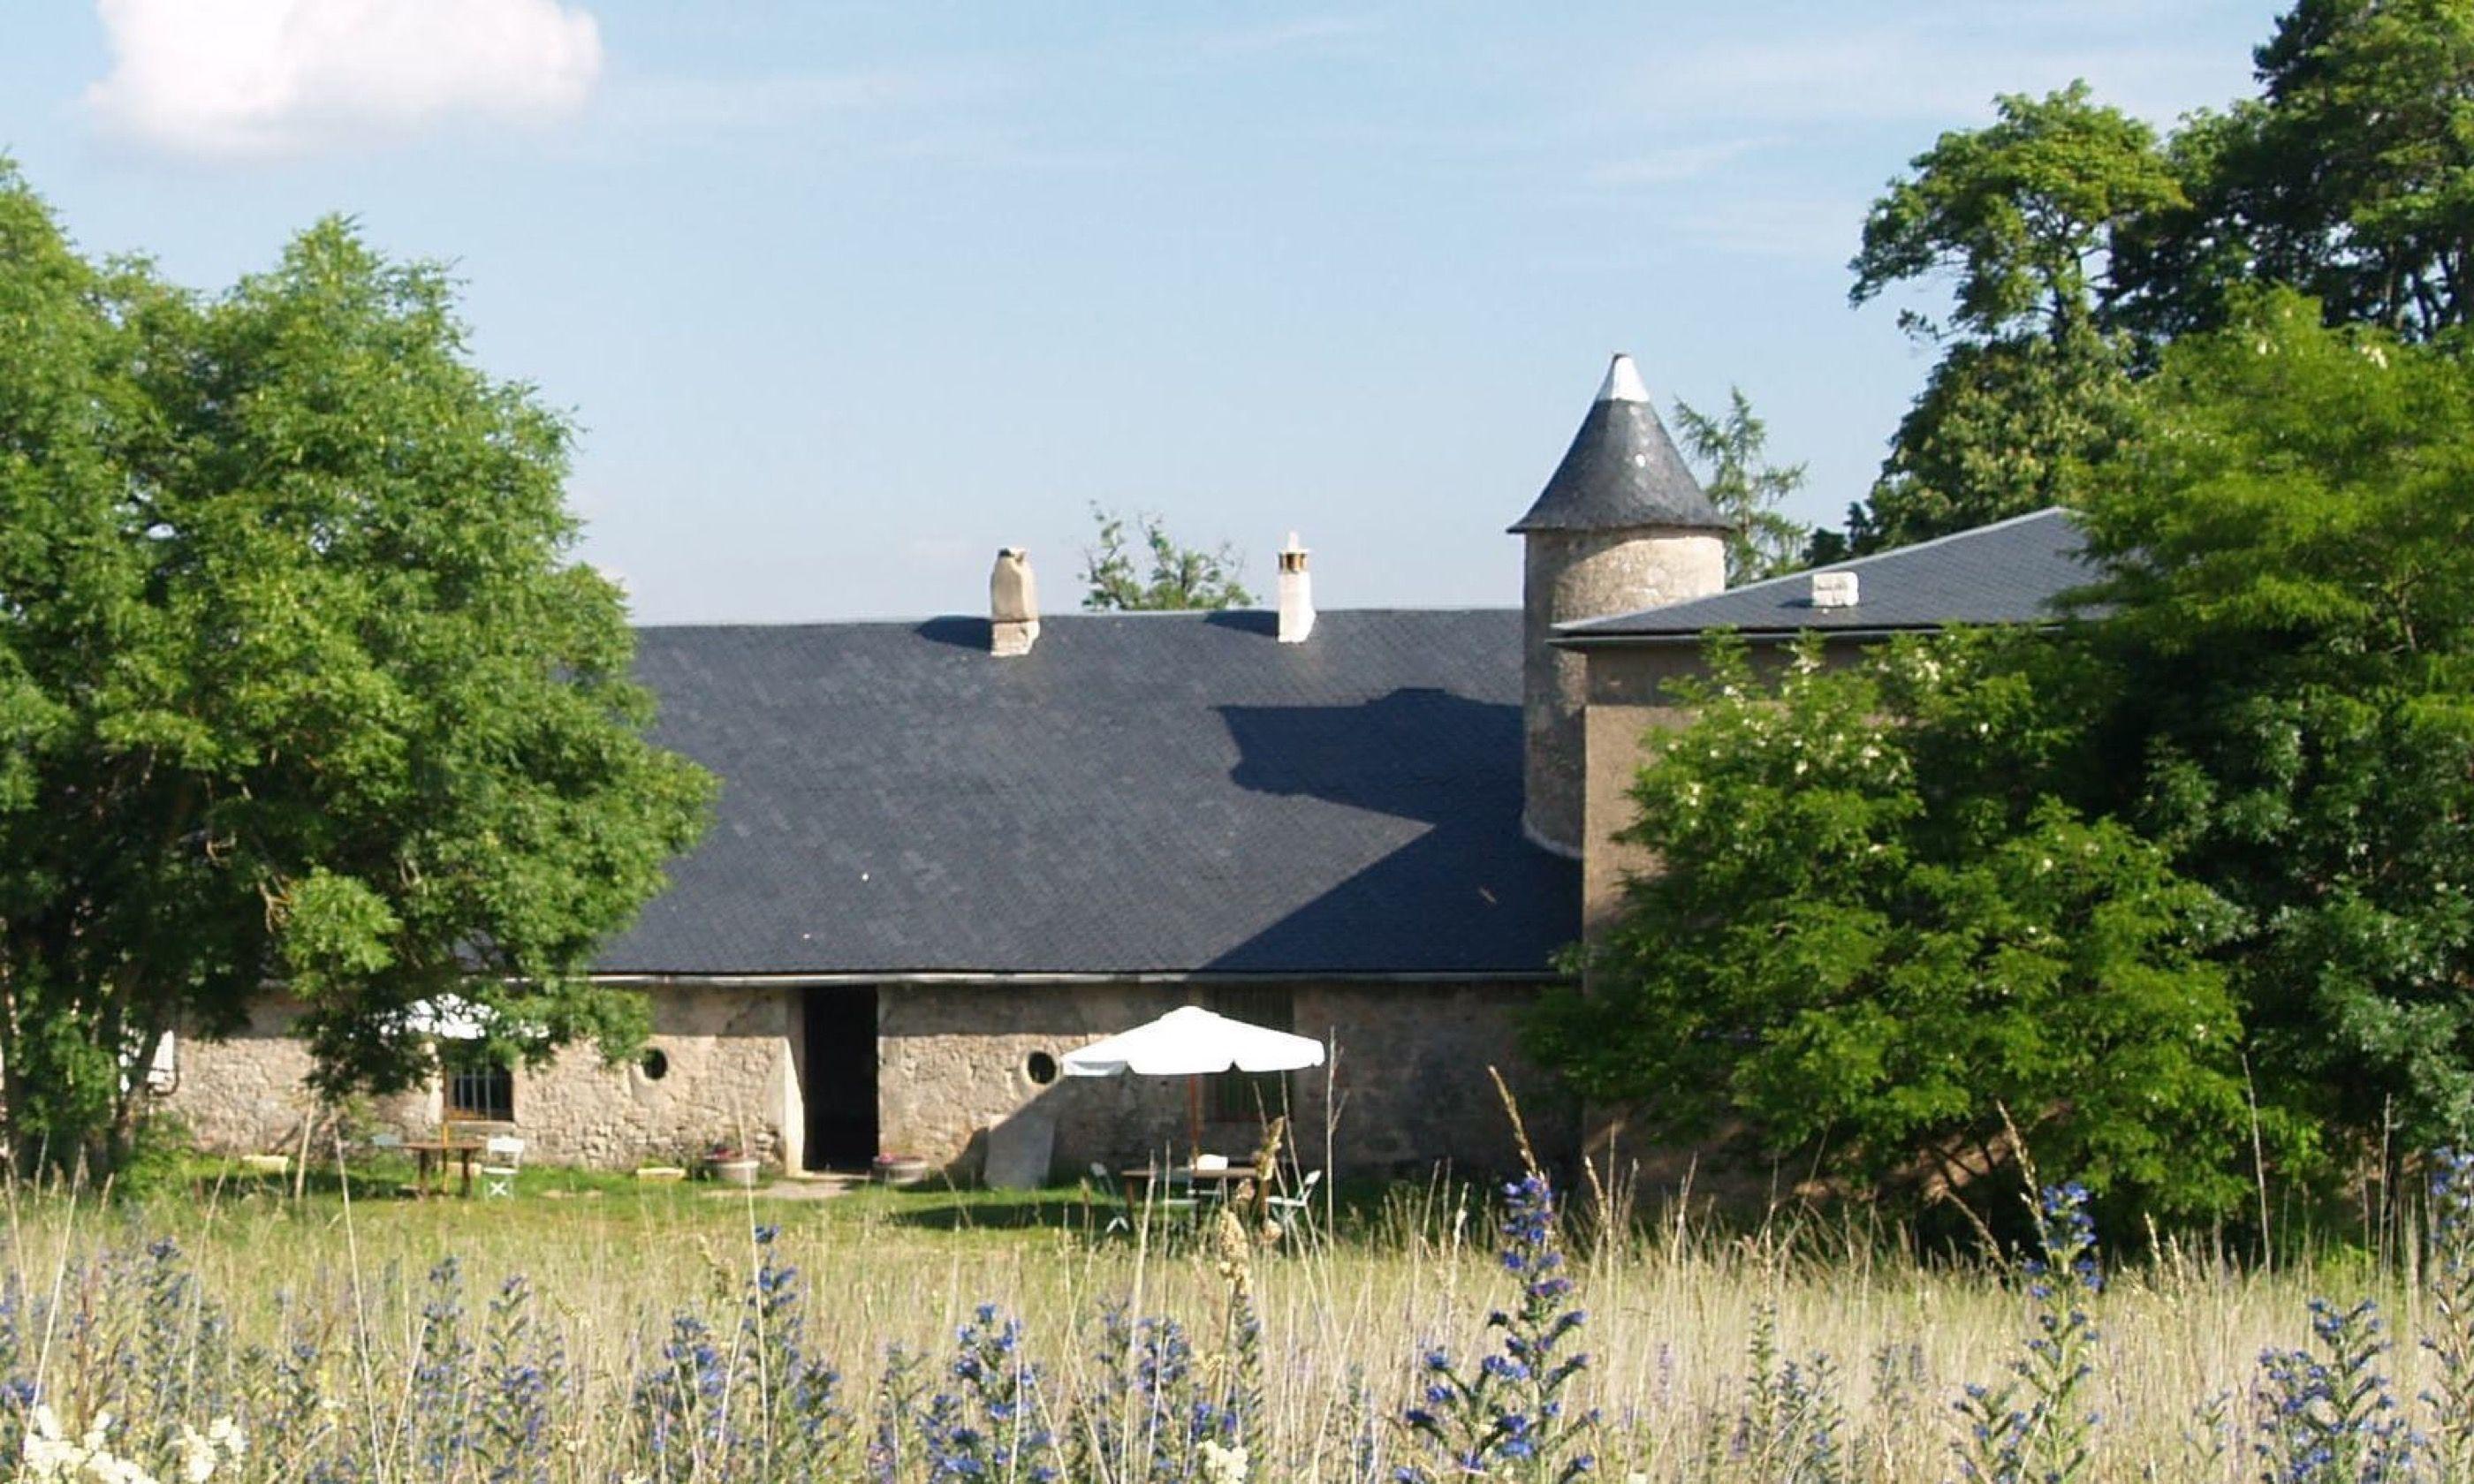 Ancient farmhouse on the campsite (domaine-de-pradines.com)